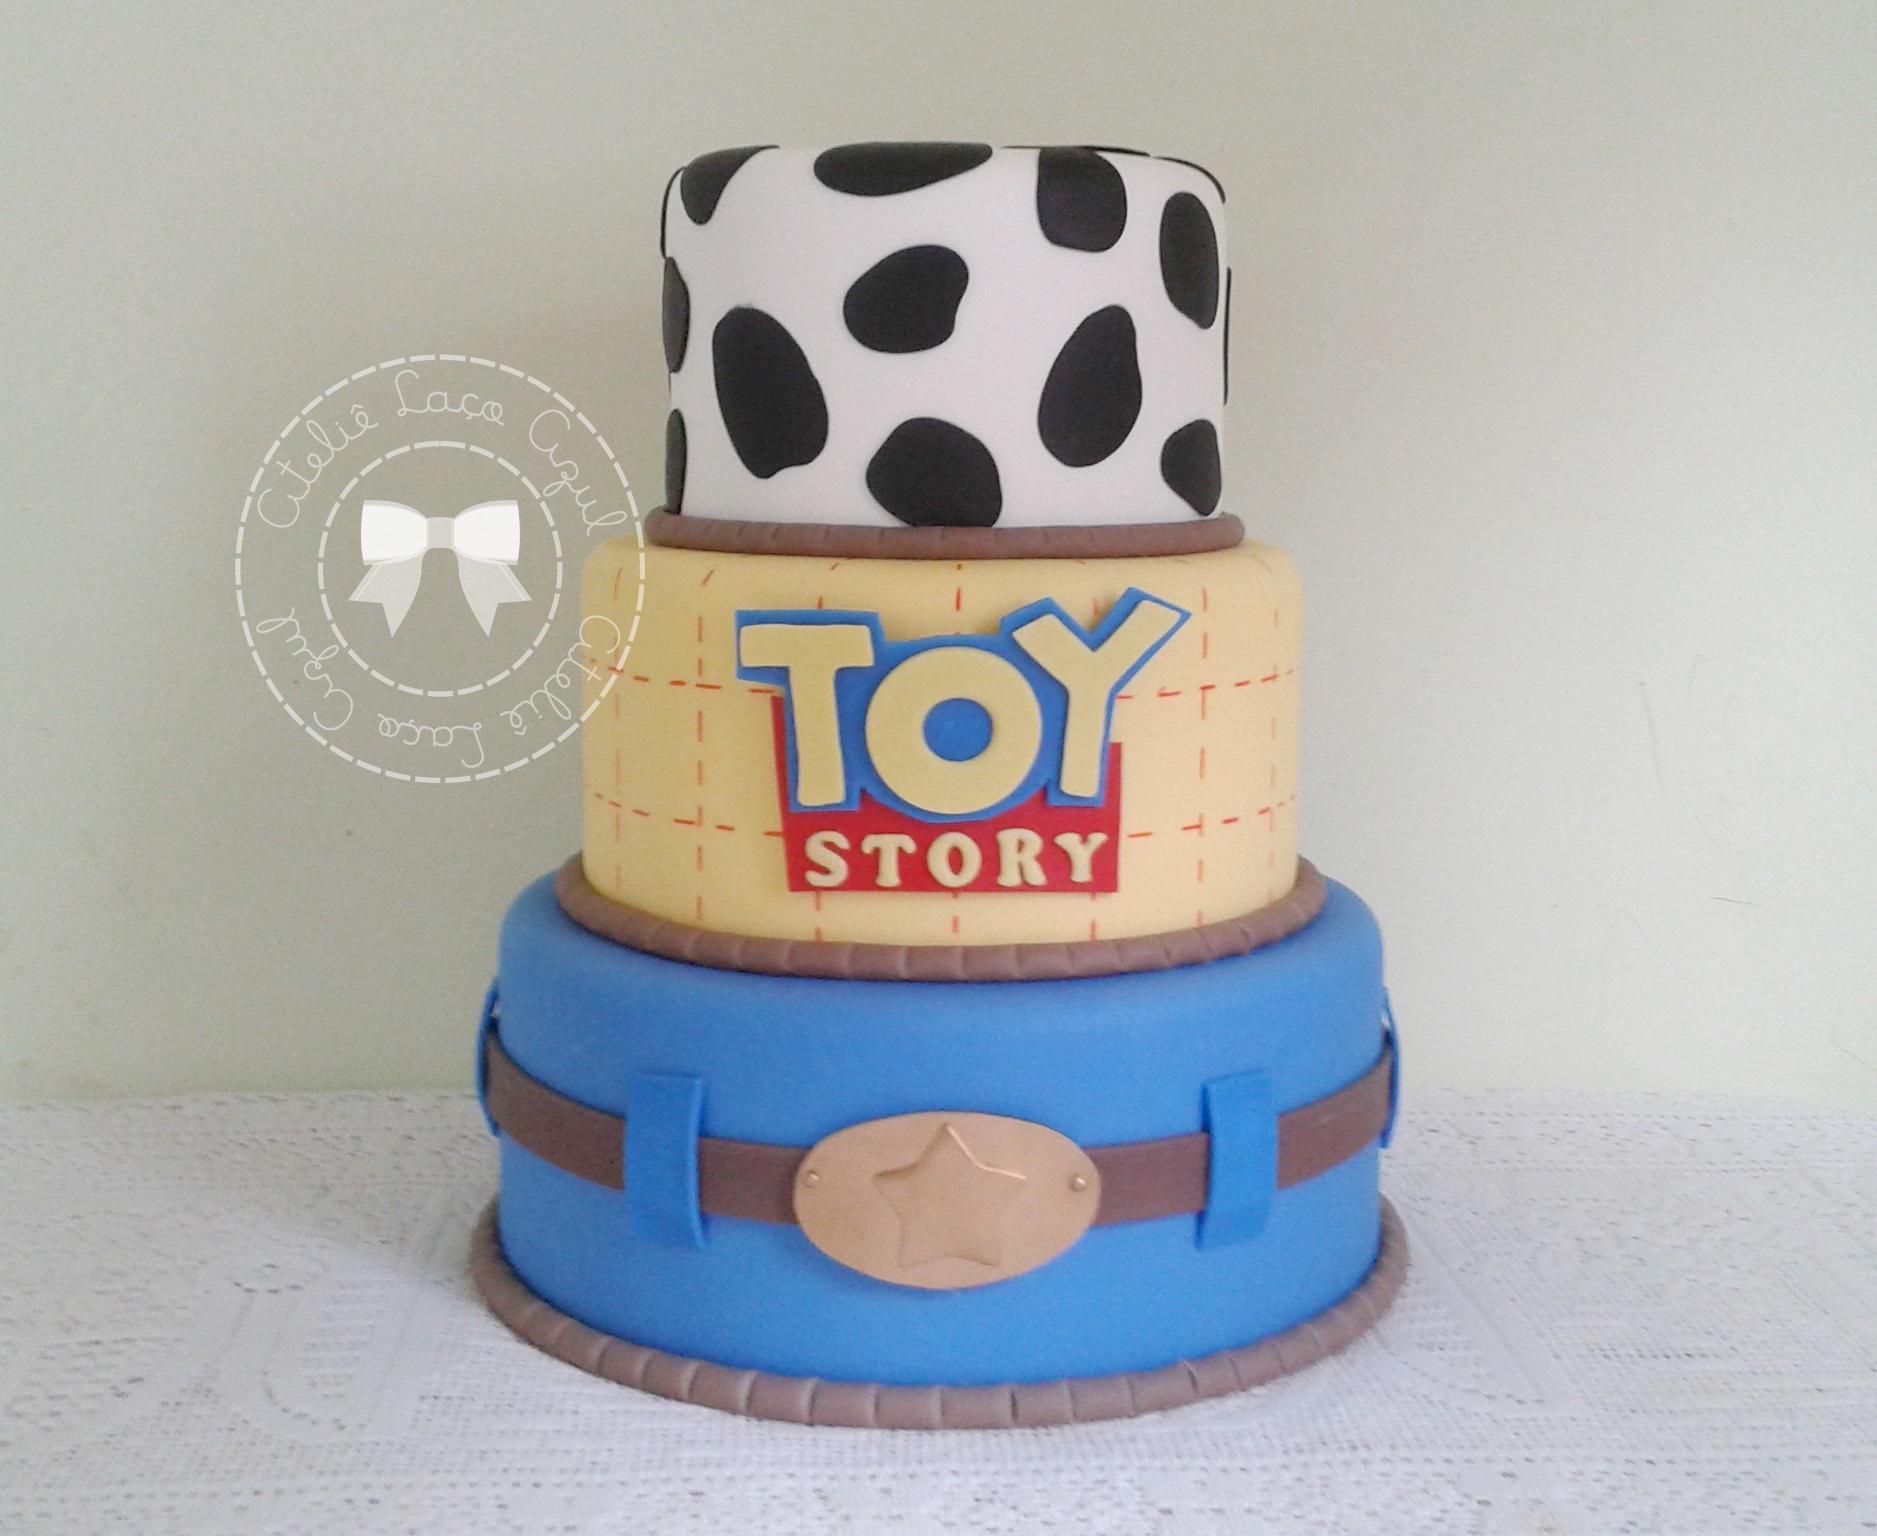 Fabuloso Bolo Toy Story no Elo7 | Ateliê Laço Azul (8139B0) KK23